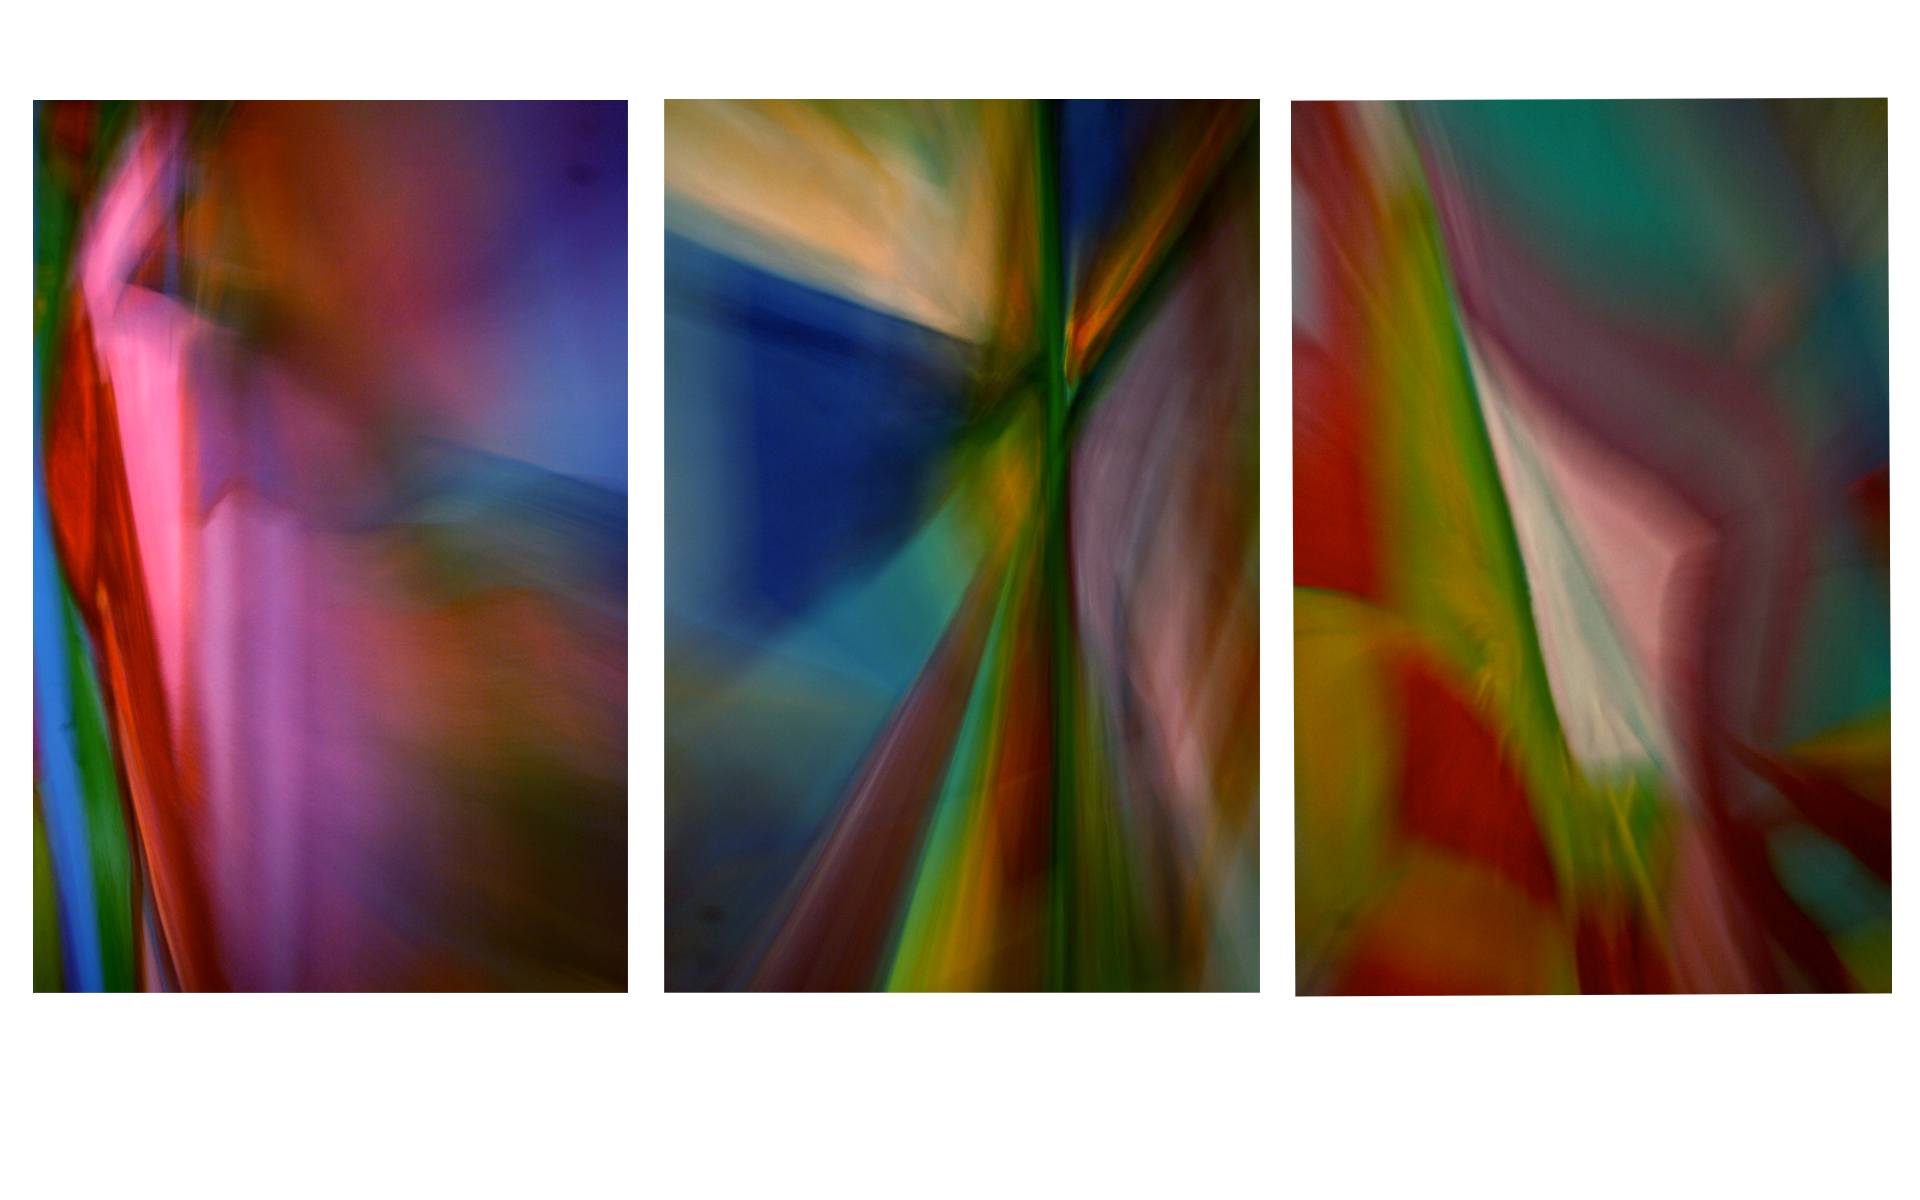 1-Light-Box-2.jpg